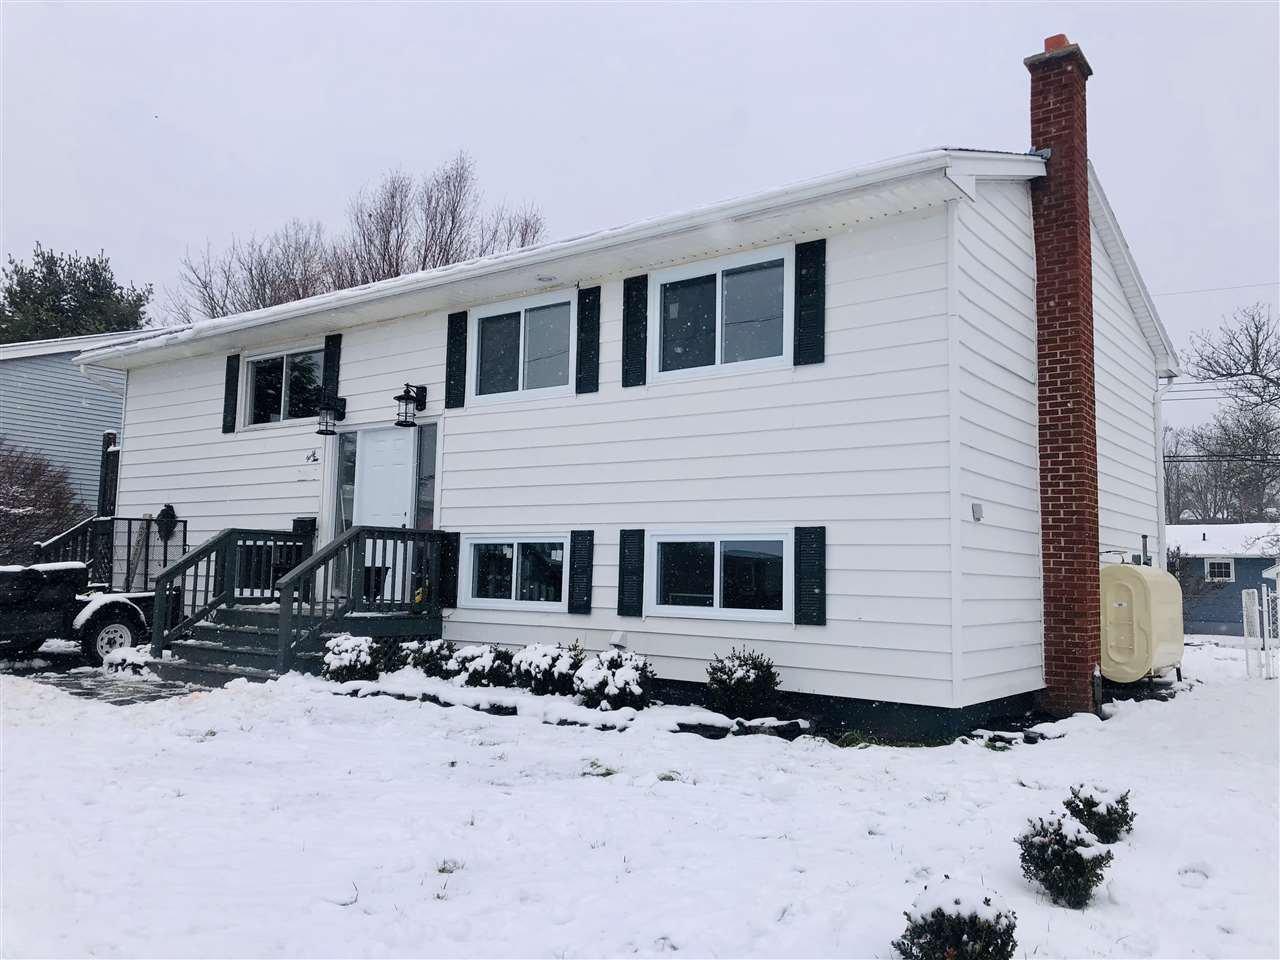 Main Photo: 42 Neily Drive in Sackville: 25-Sackville Residential for sale (Halifax-Dartmouth)  : MLS®# 202100157